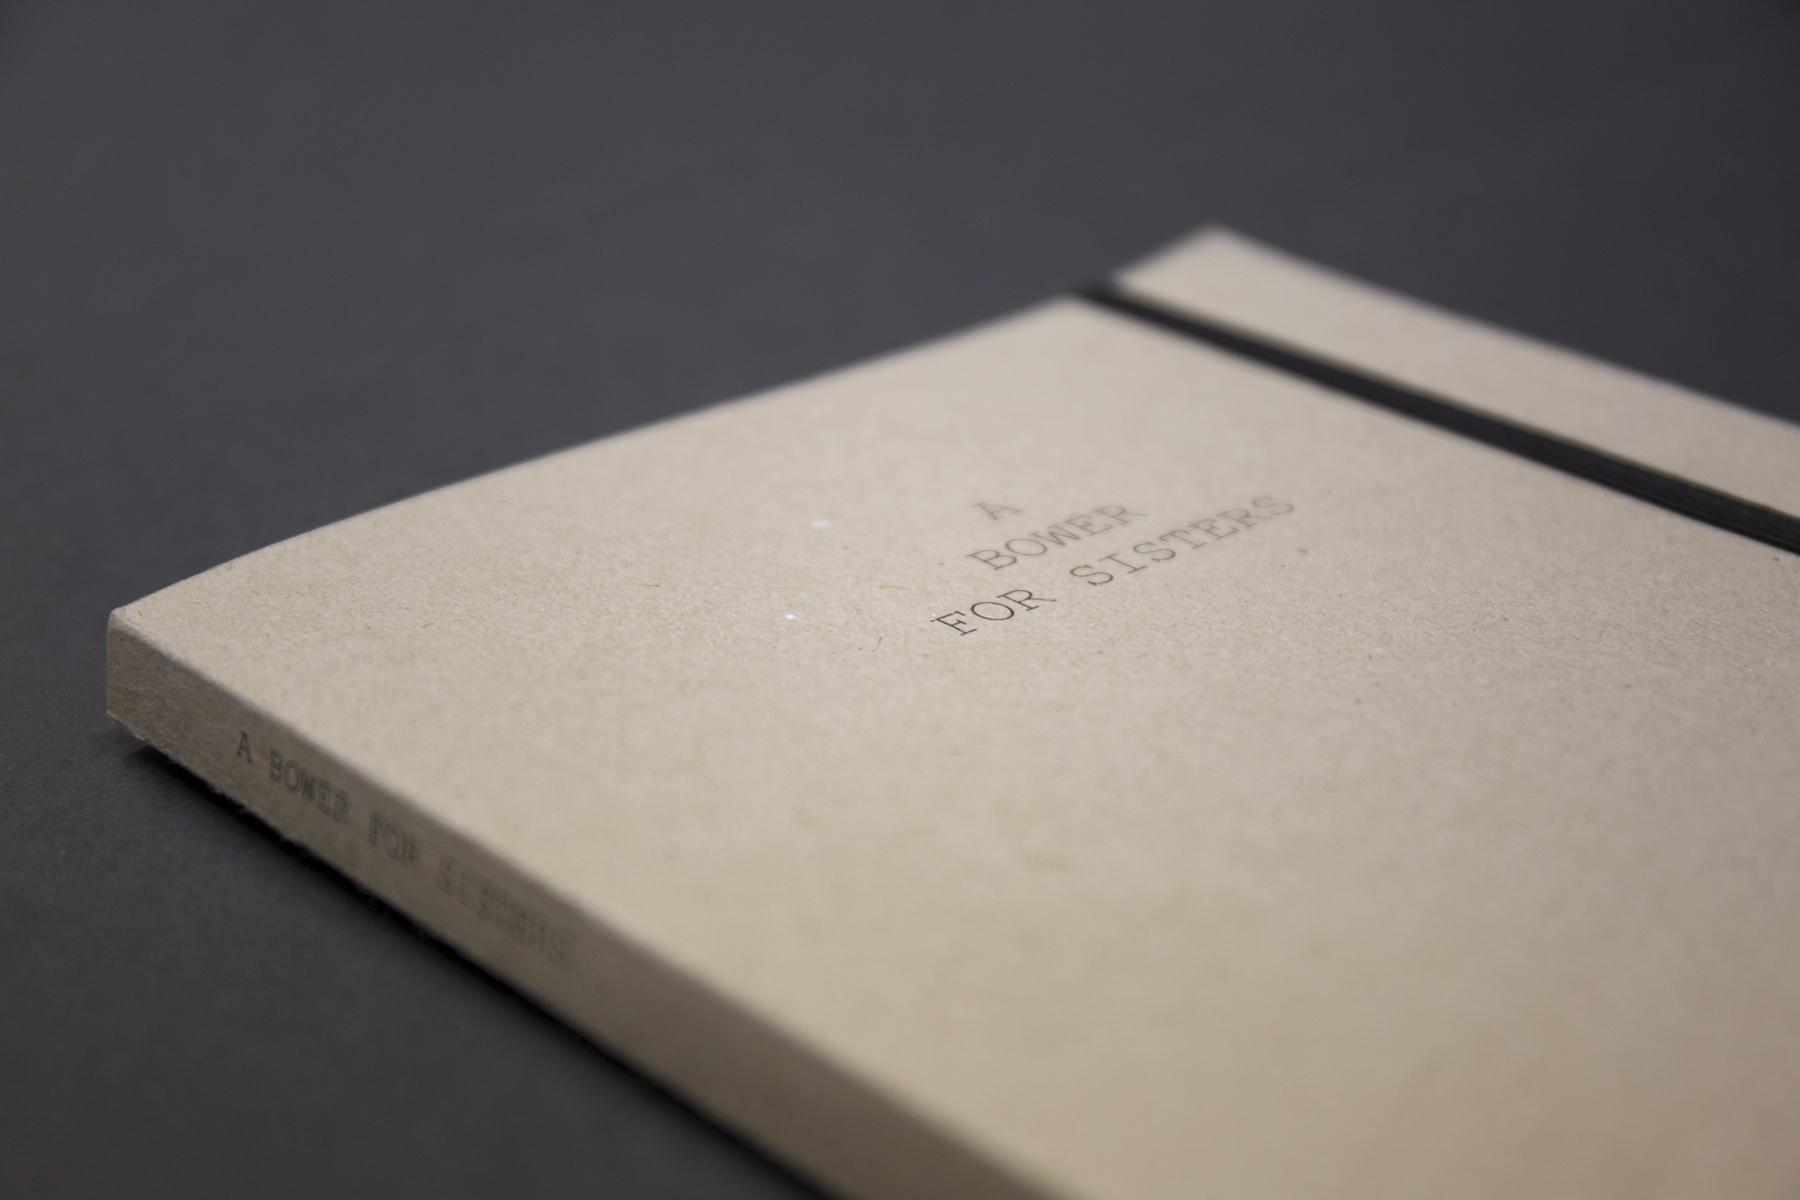 abowerforsisters-book-3.jpg